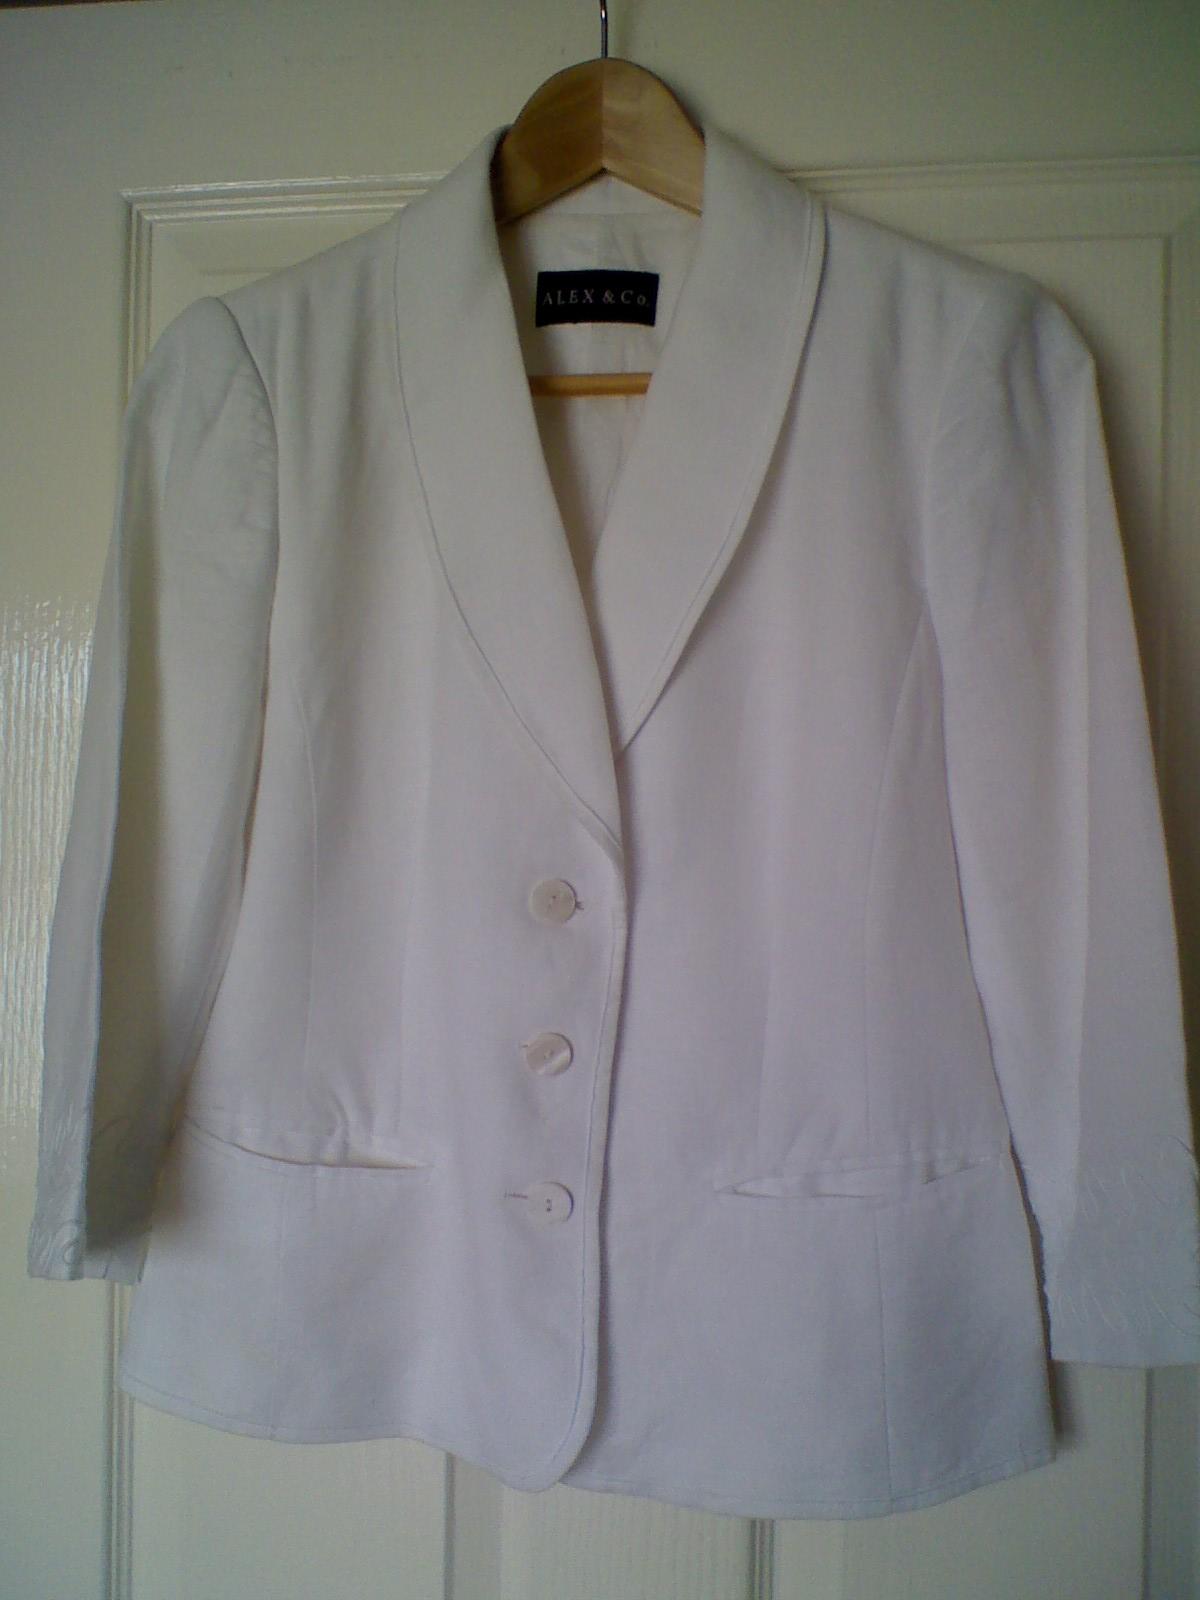 http://3.bp.blogspot.com/_aRIDhe4WZ4c/S9Rw0mleMUI/AAAAAAAAEv0/vAhoktJ_-sI/s1600/white+cropped+blazer.jpg